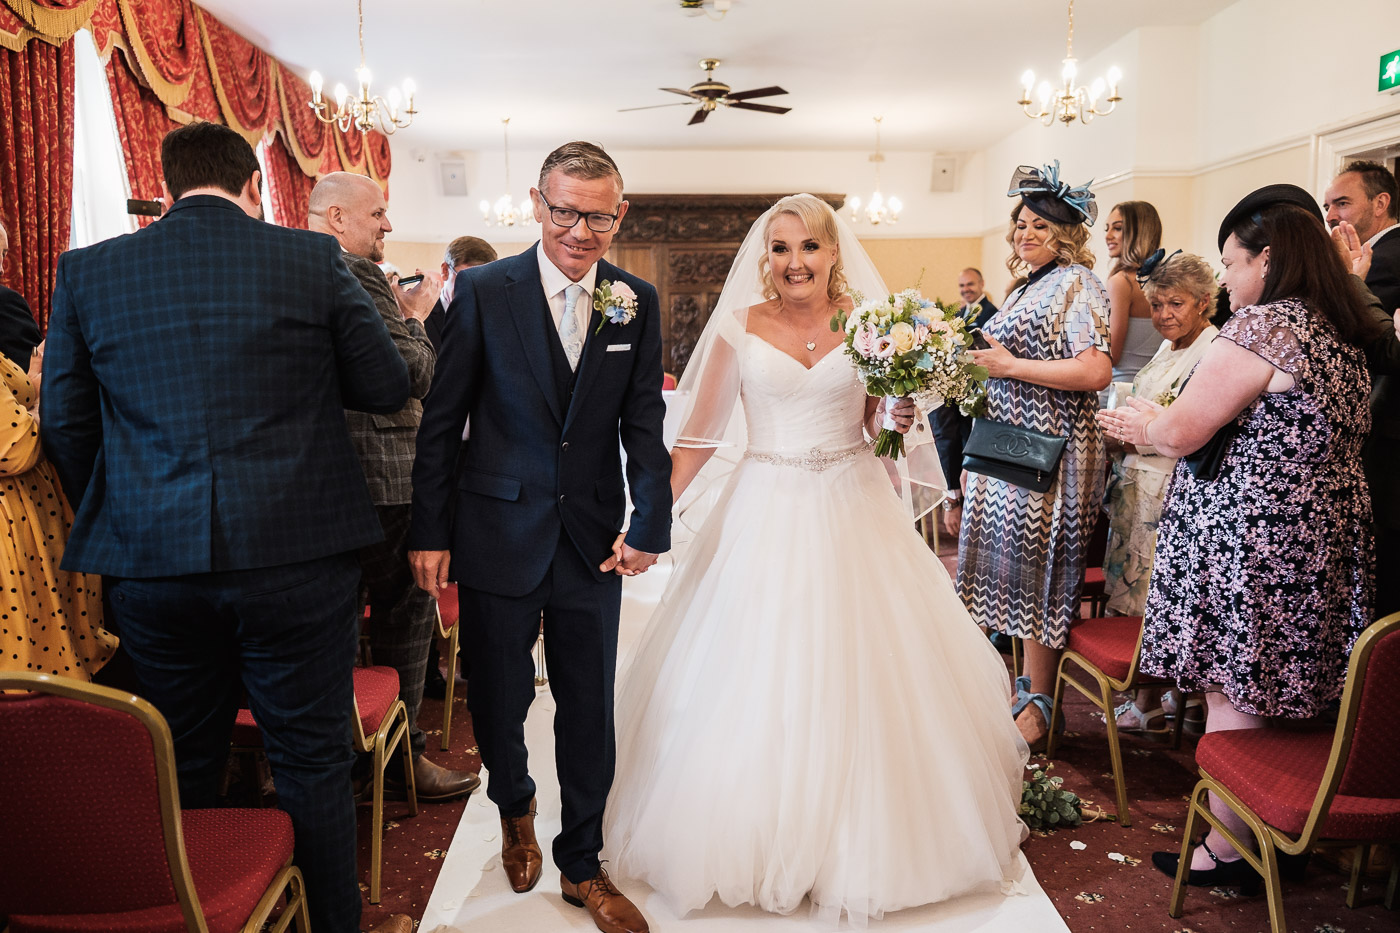 newlyweds walk hand in hand at Walton hall